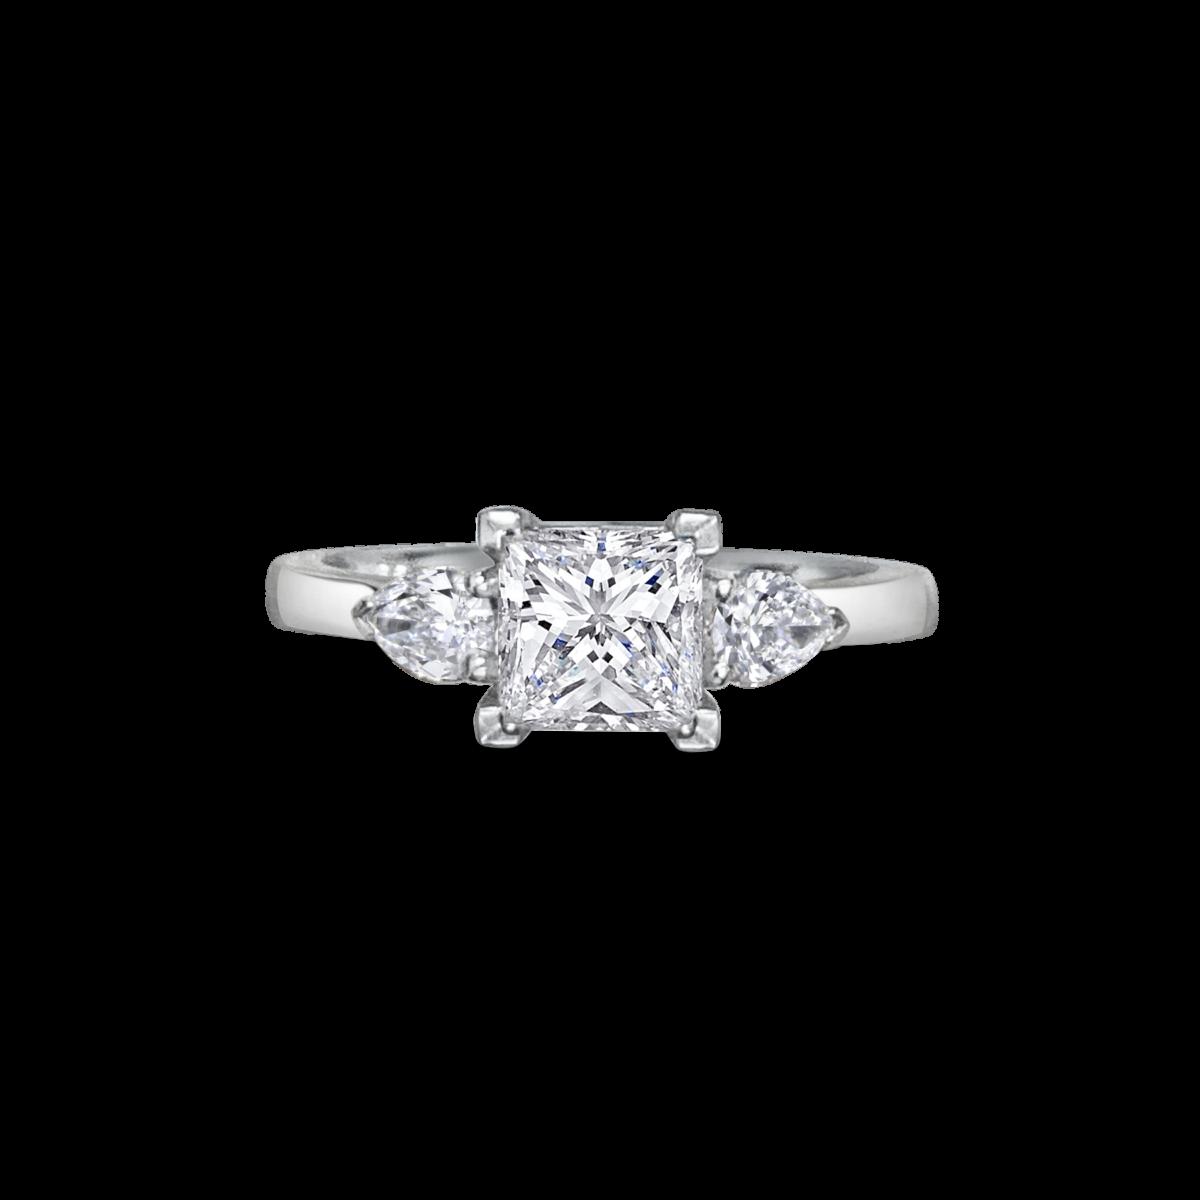 Elsa Princess Three Stone Pear Diamond Engagement Ring Front View